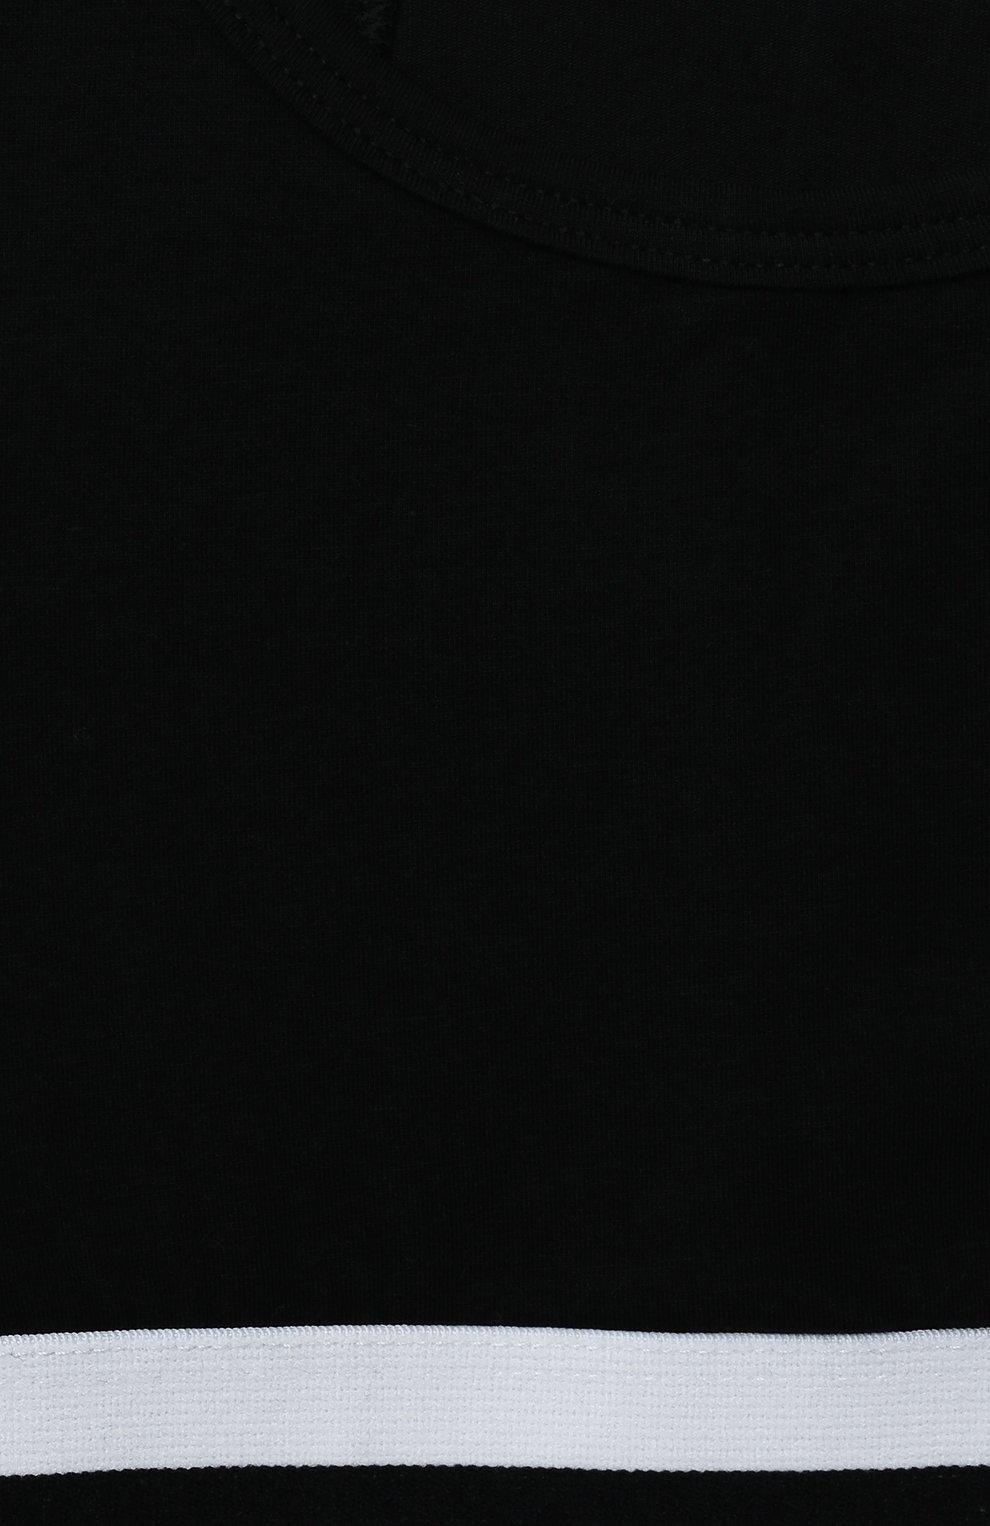 Детский бра-топ SANETTA черного цвета, арт. 346632. | Фото 3